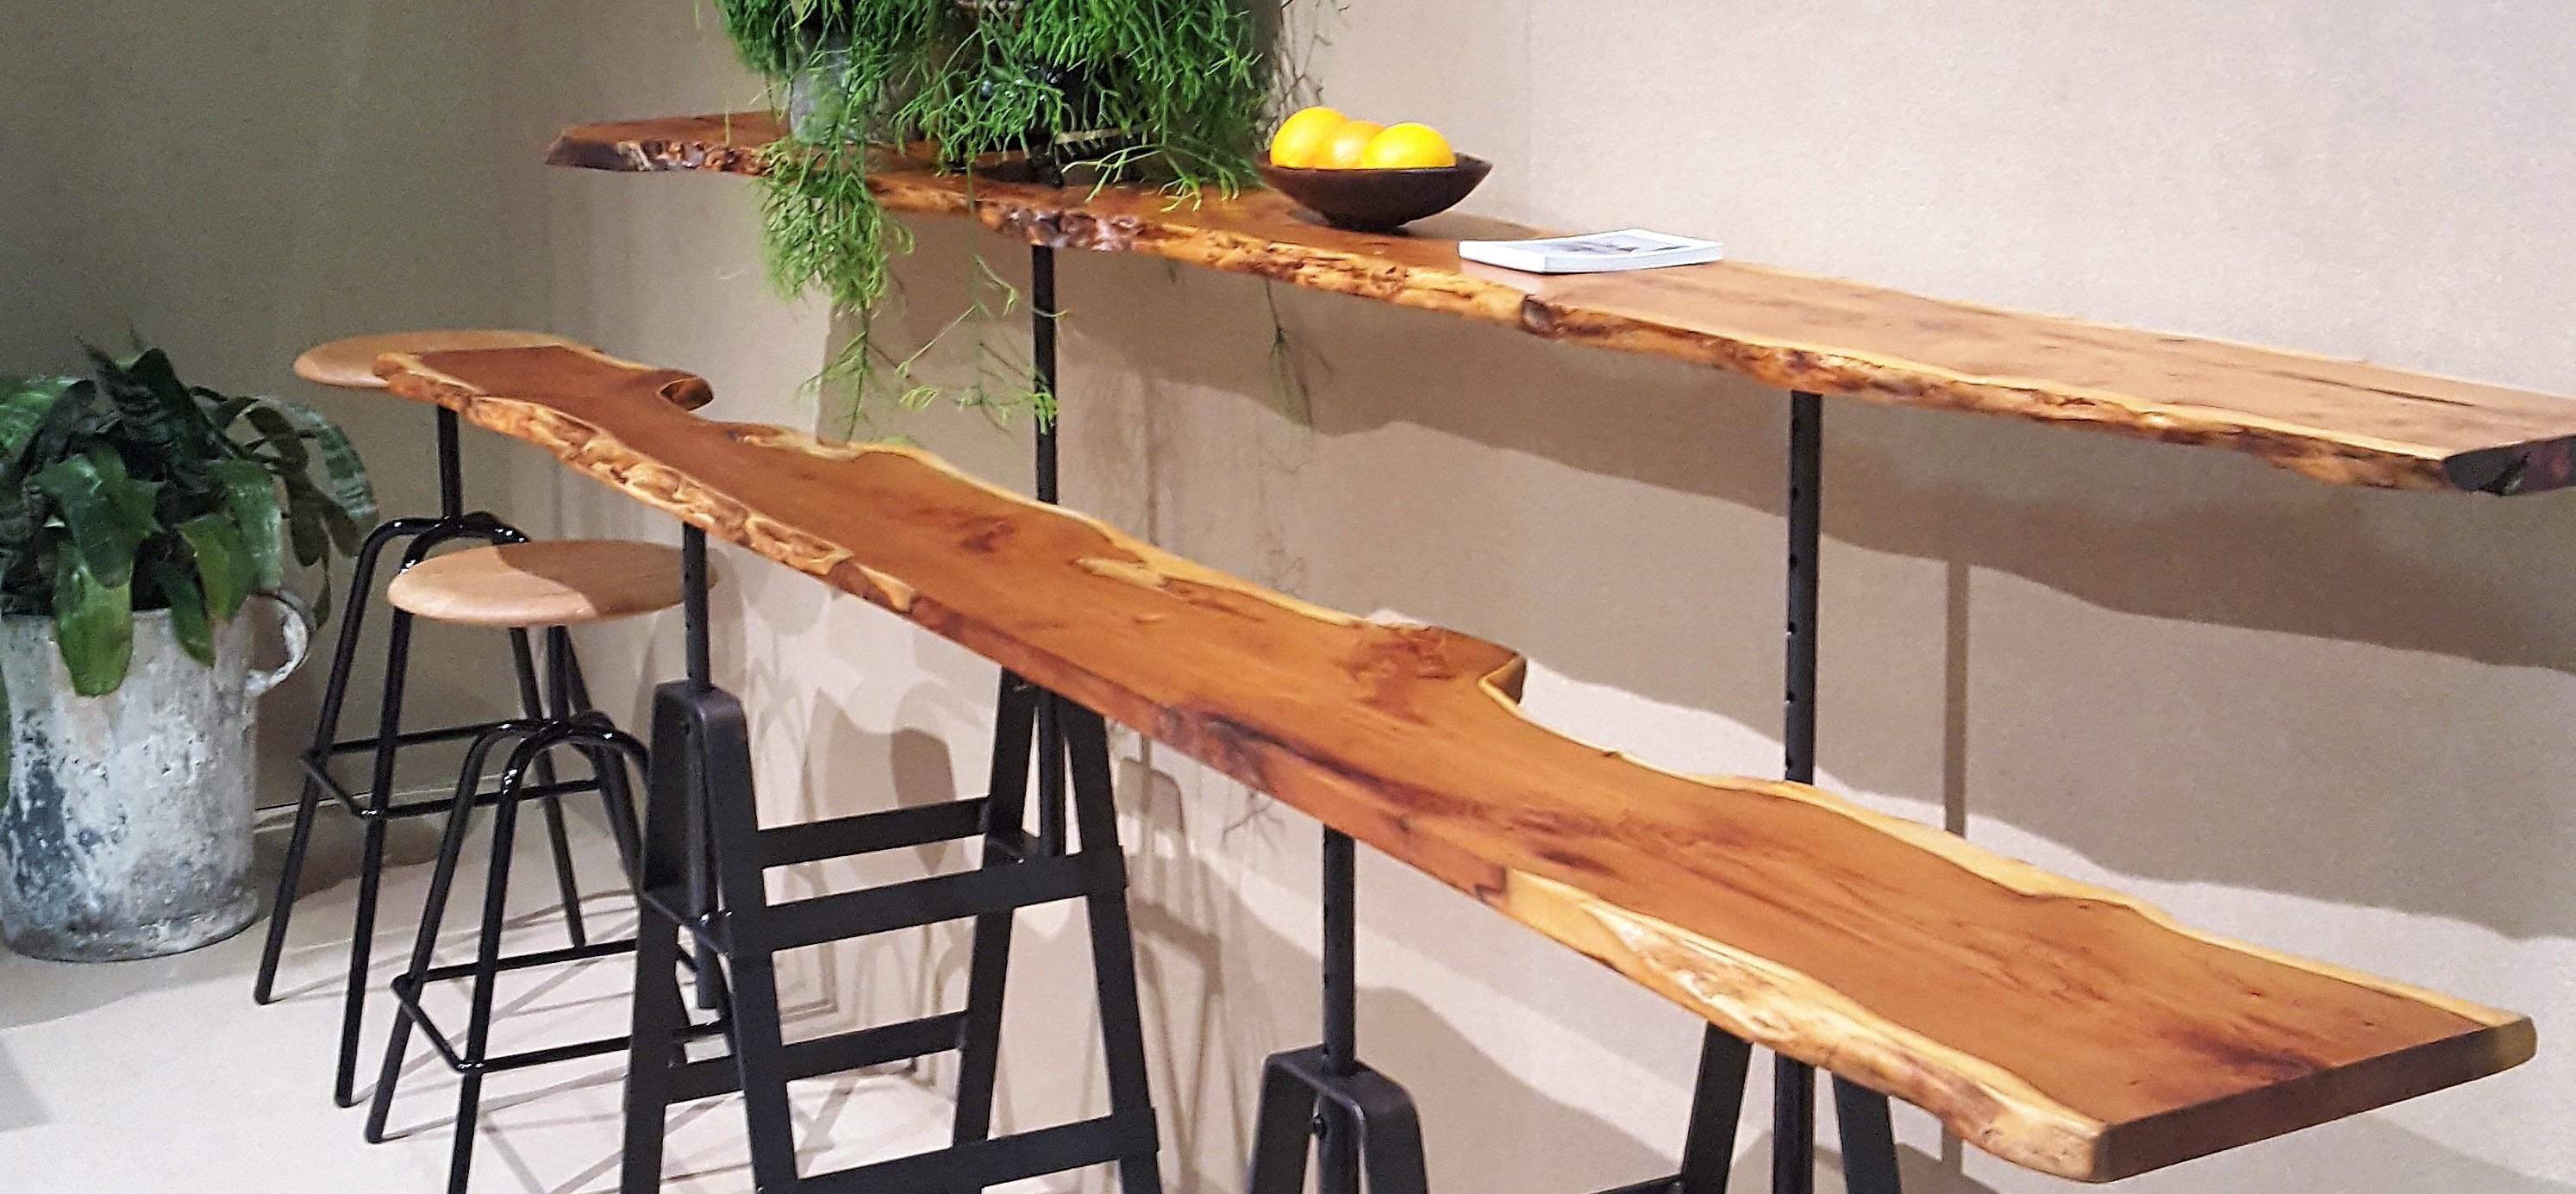 waney edge table tops on trestle base